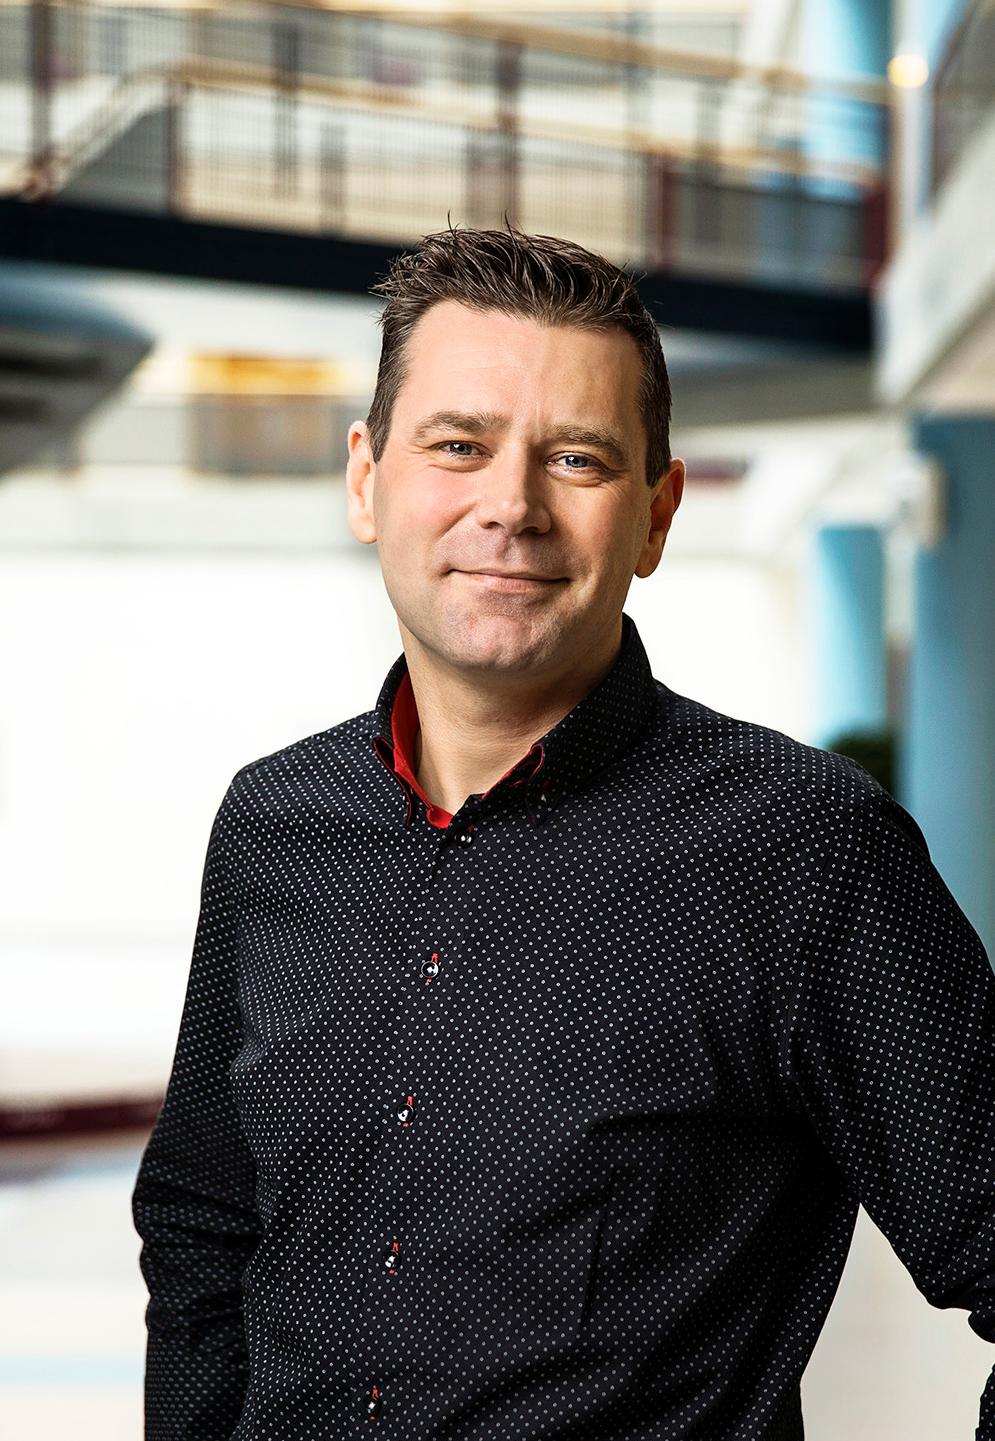 Ricardo Franke, staff advisor patient logistics at UMCG and coordinator for the RayCare implementation